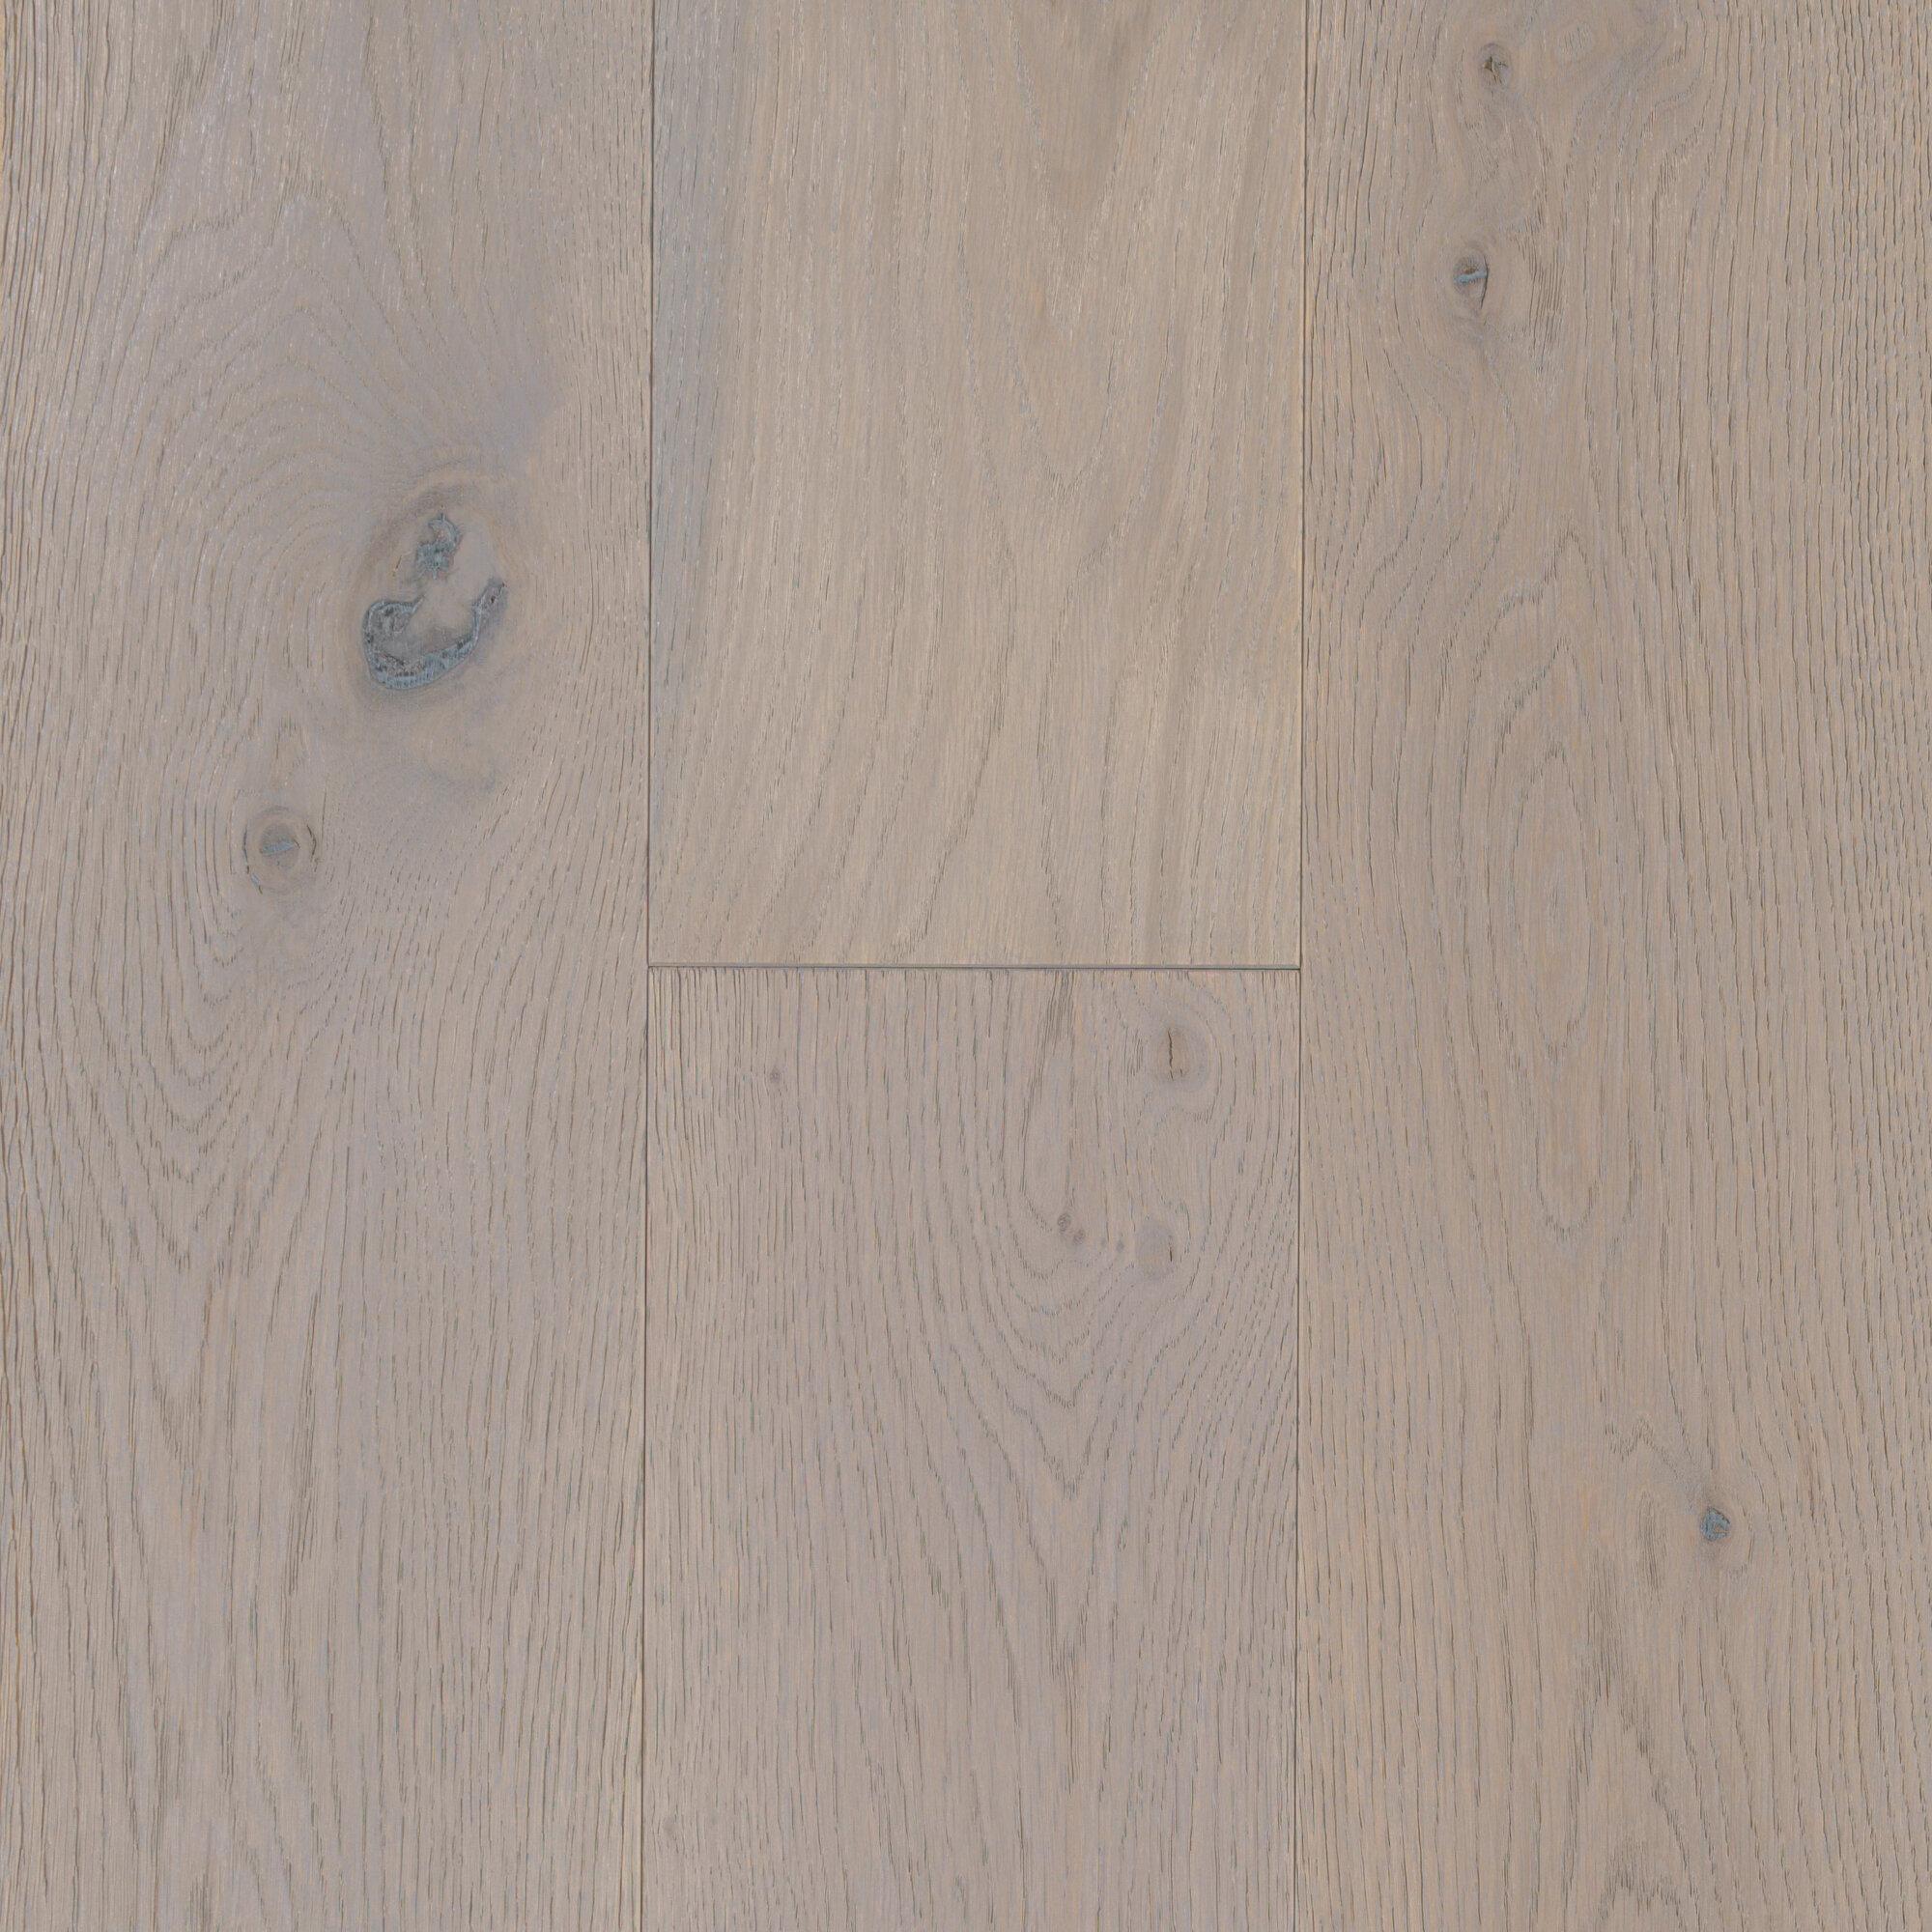 Grey Oak Hardwood Floors